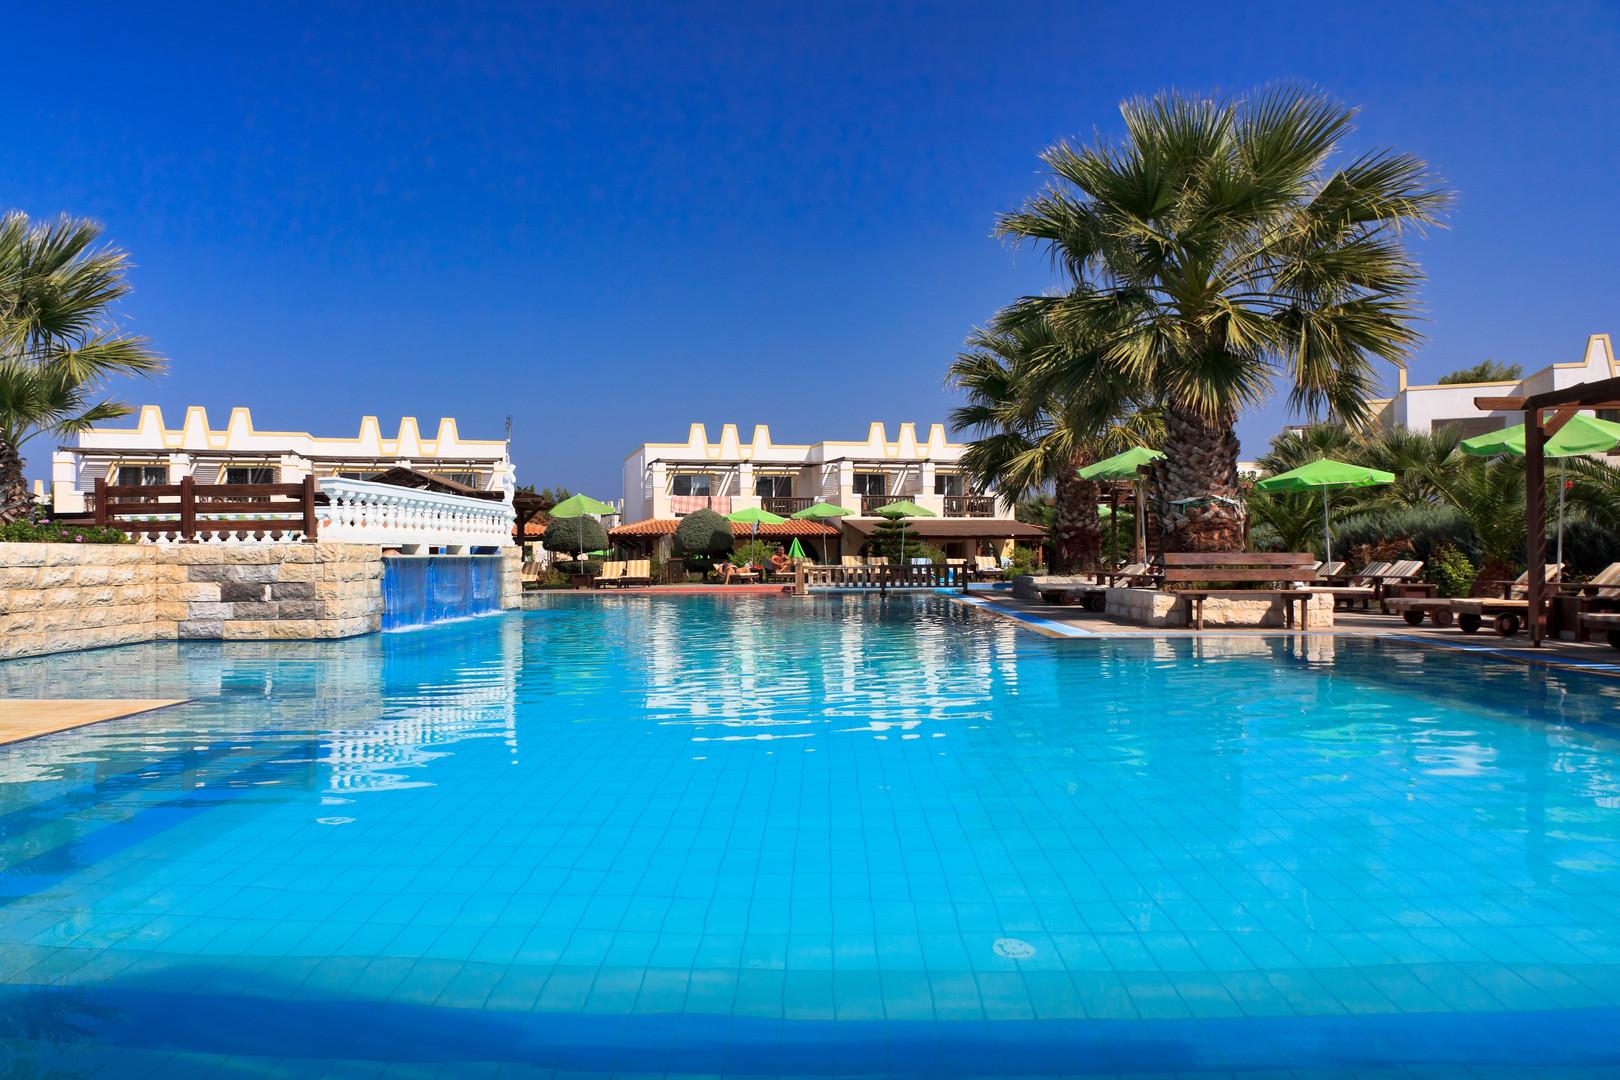 Hotel Gaia Royal Resort #5